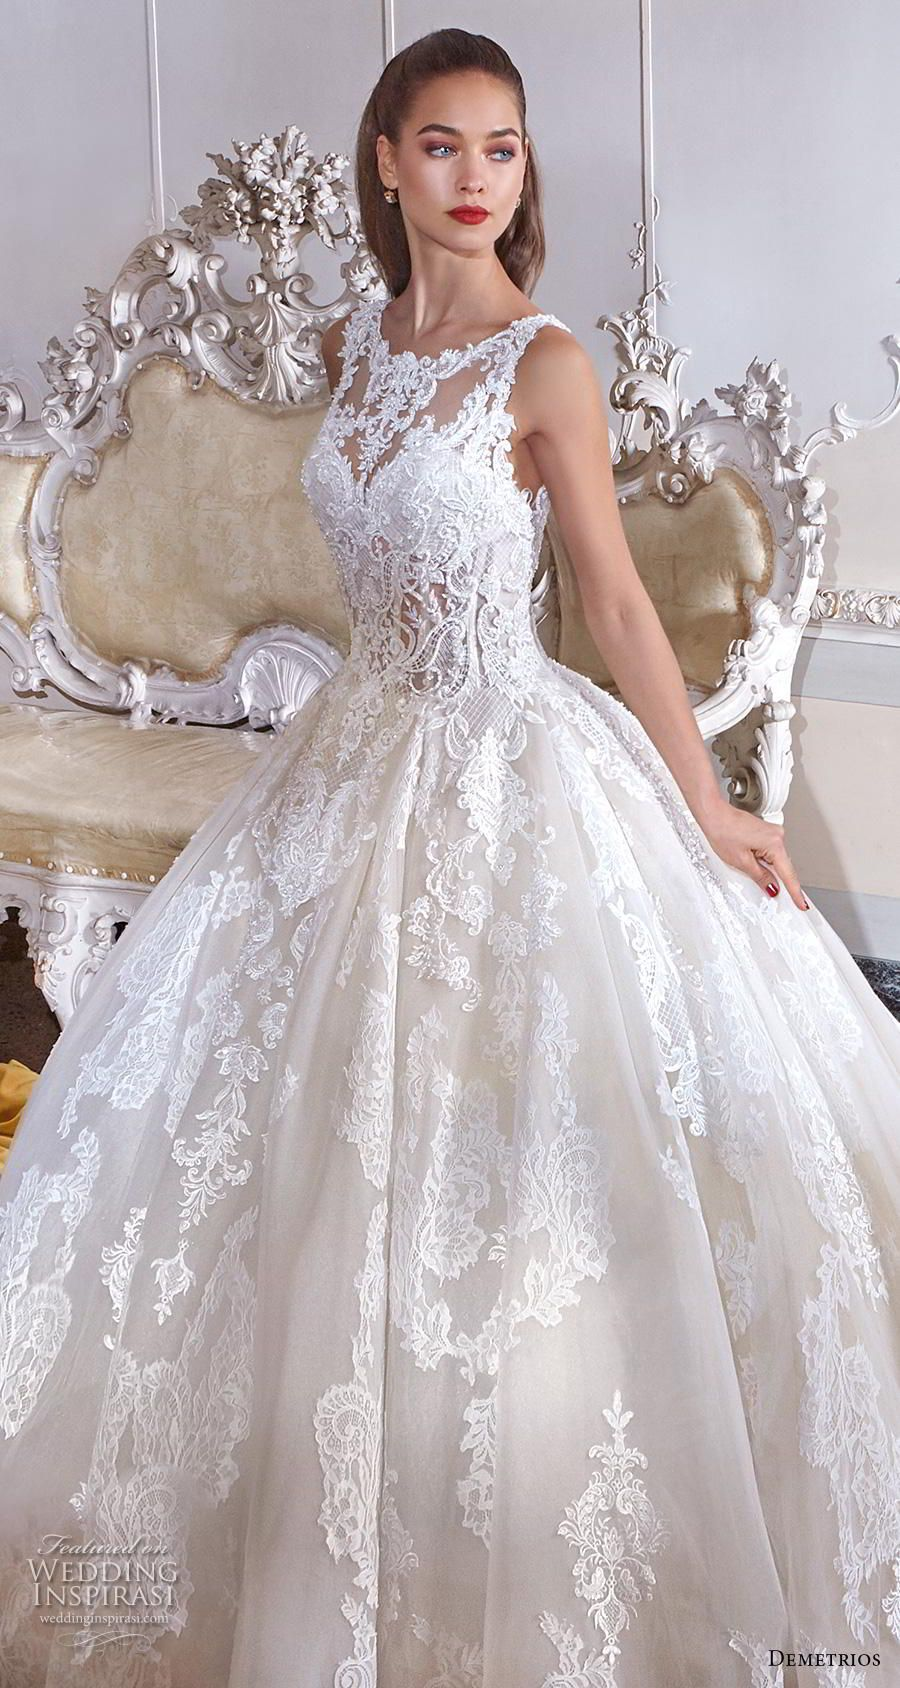 Platinum by Demetrios 2019 Wedding Dresses in 2020 Lace